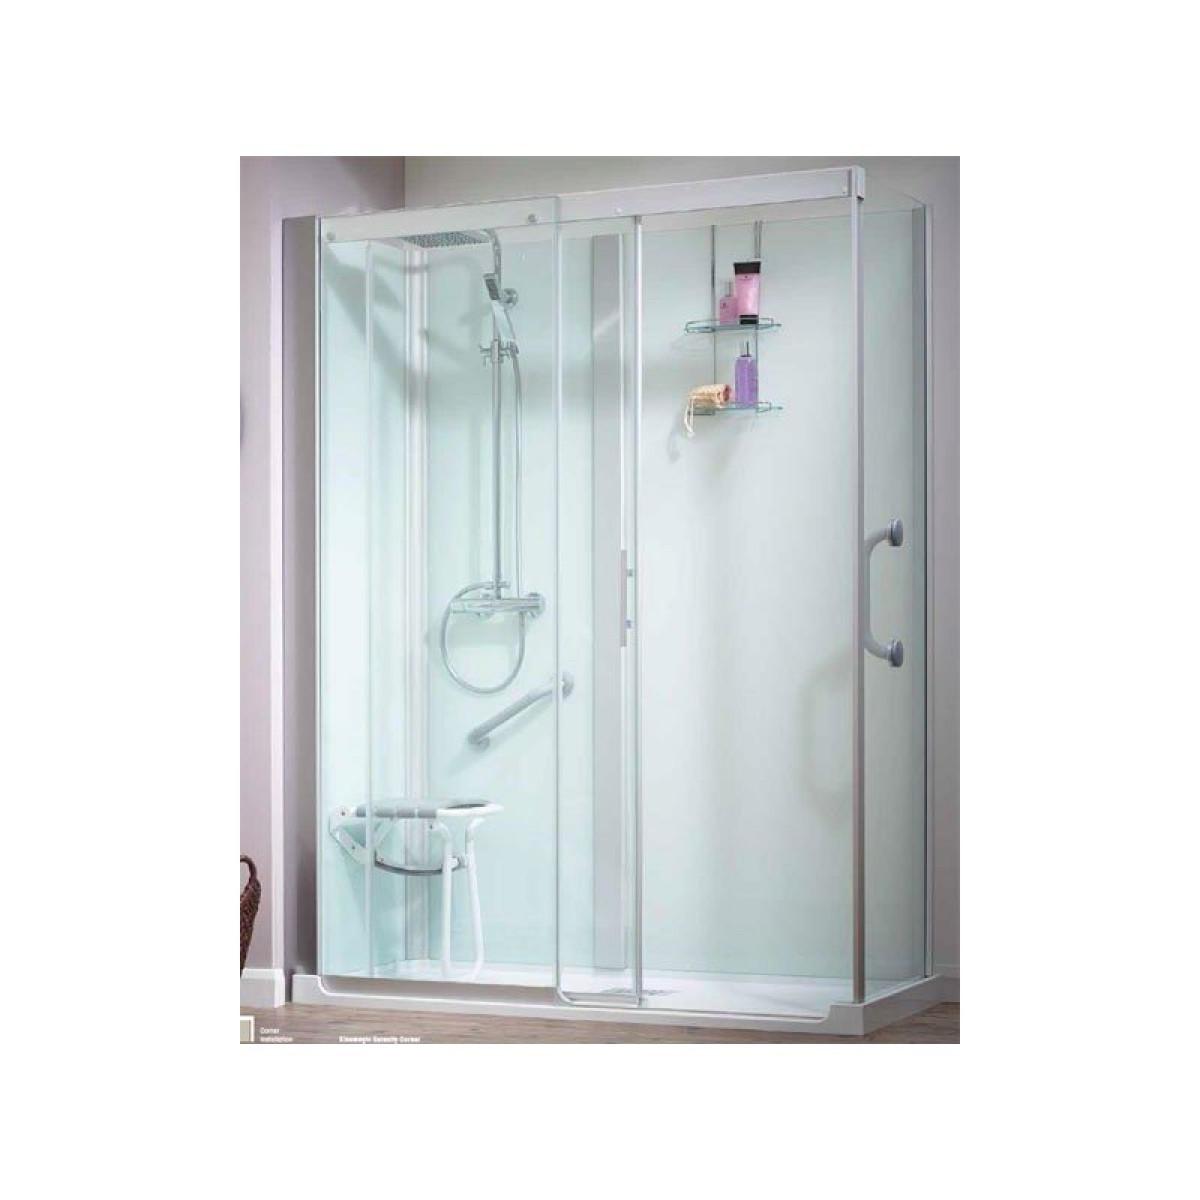 Kinemagic serenity 1700 x 800mm corner thermo k5 1708 for 1700 high shower door